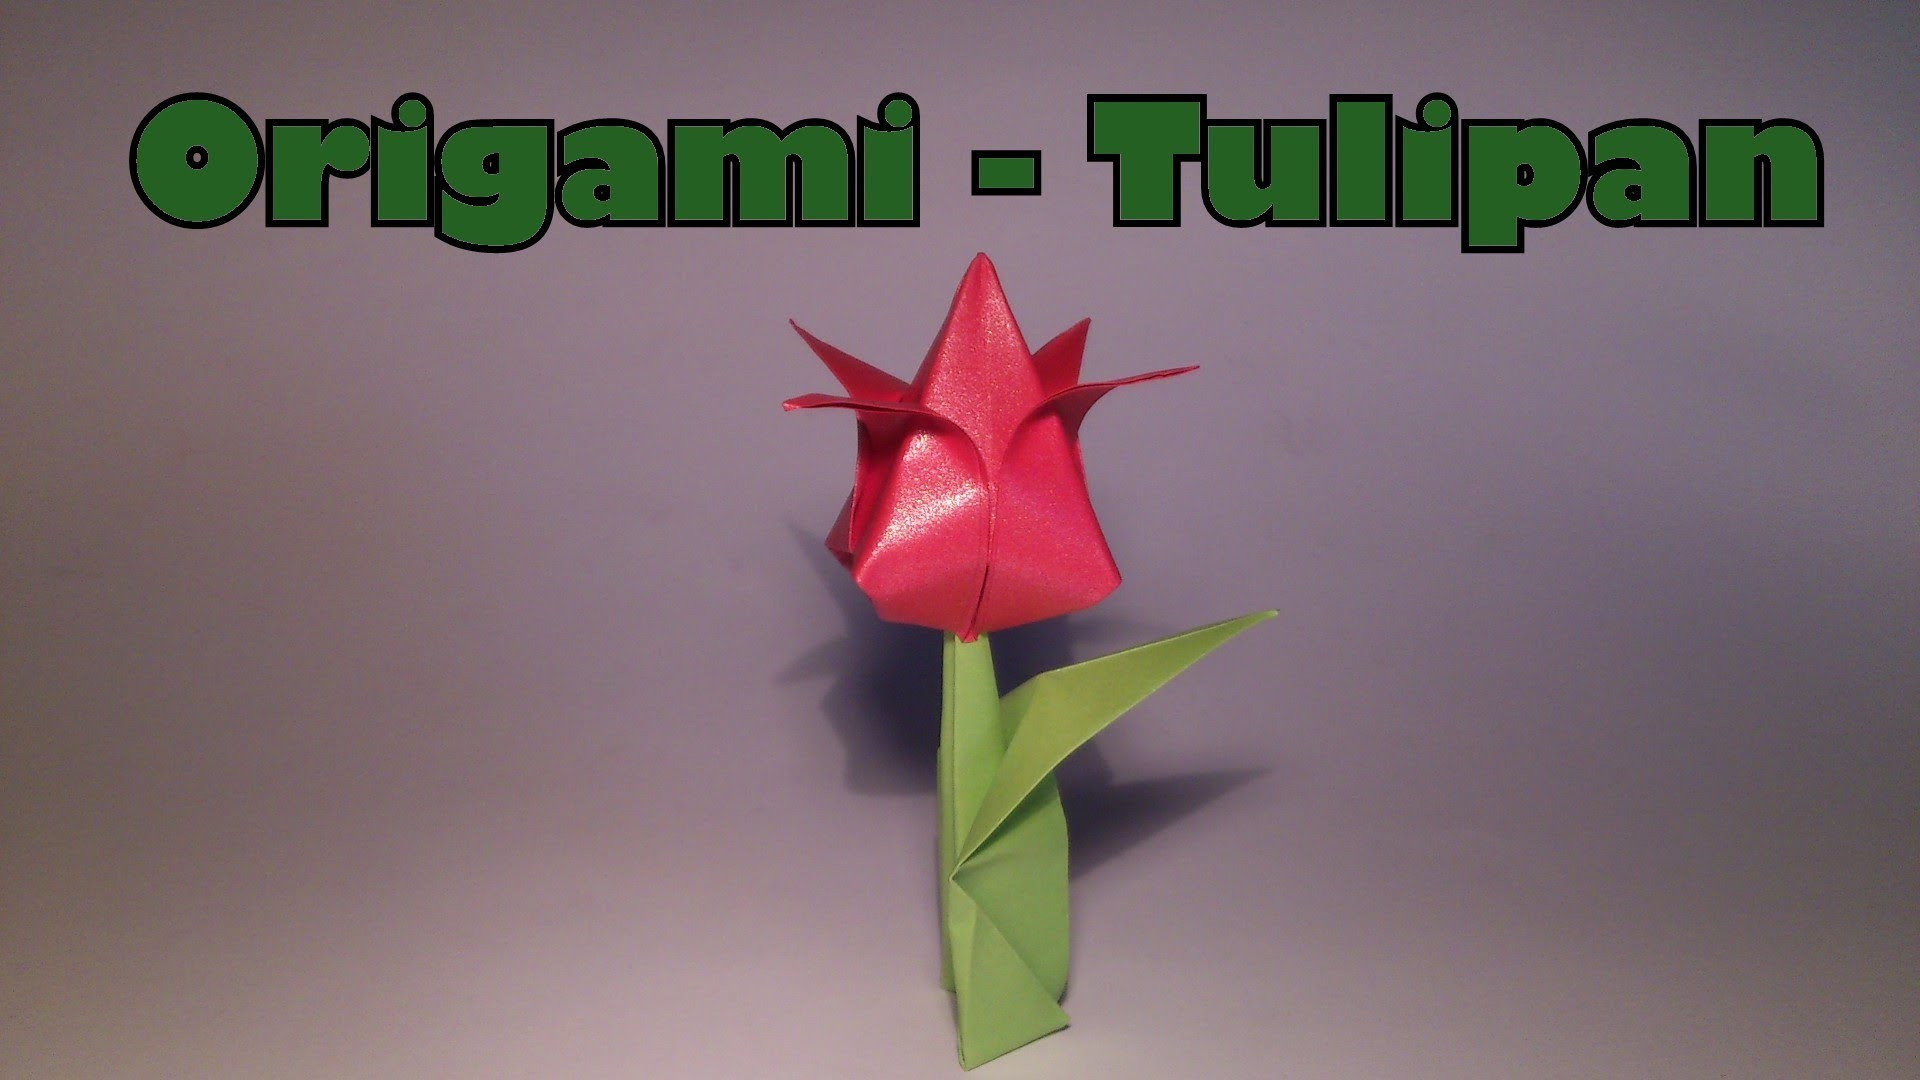 Origami - Tulipan (Chcecie VLOGA?)